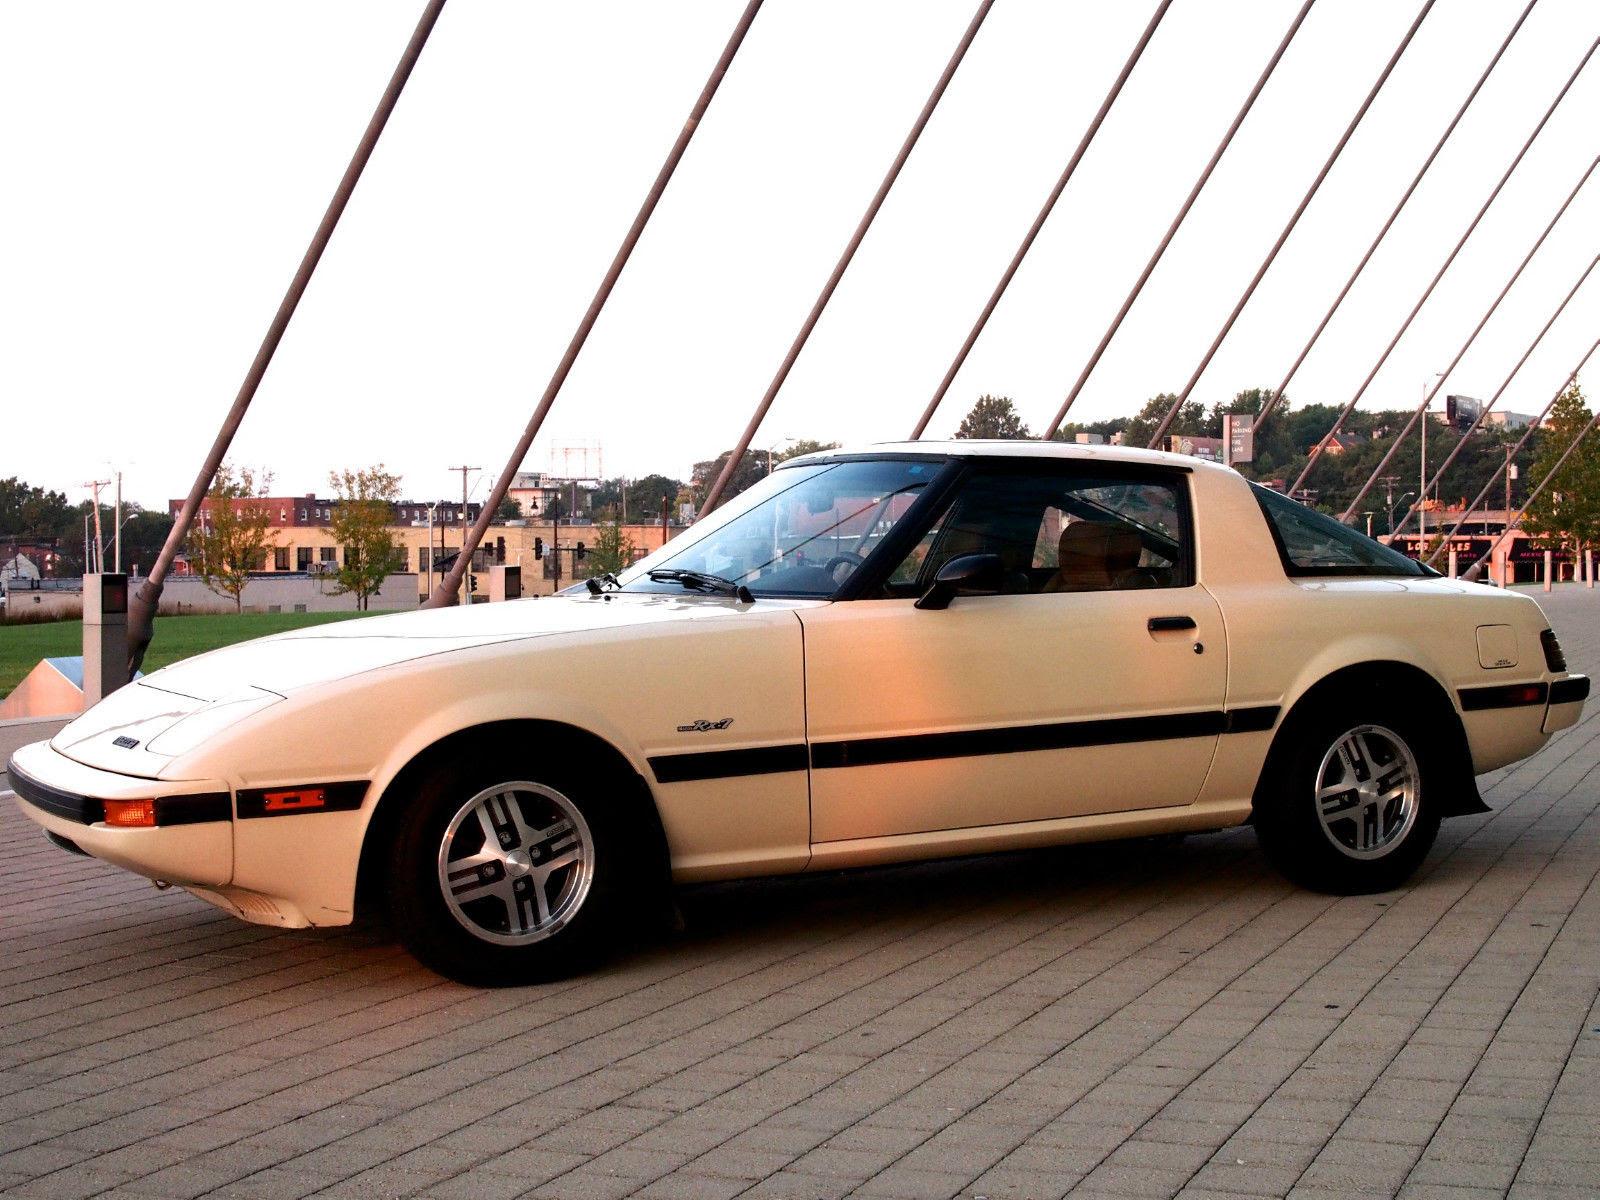 Super Clean 1985 Rx7 Gsl For Sale In Kansas City Missouri